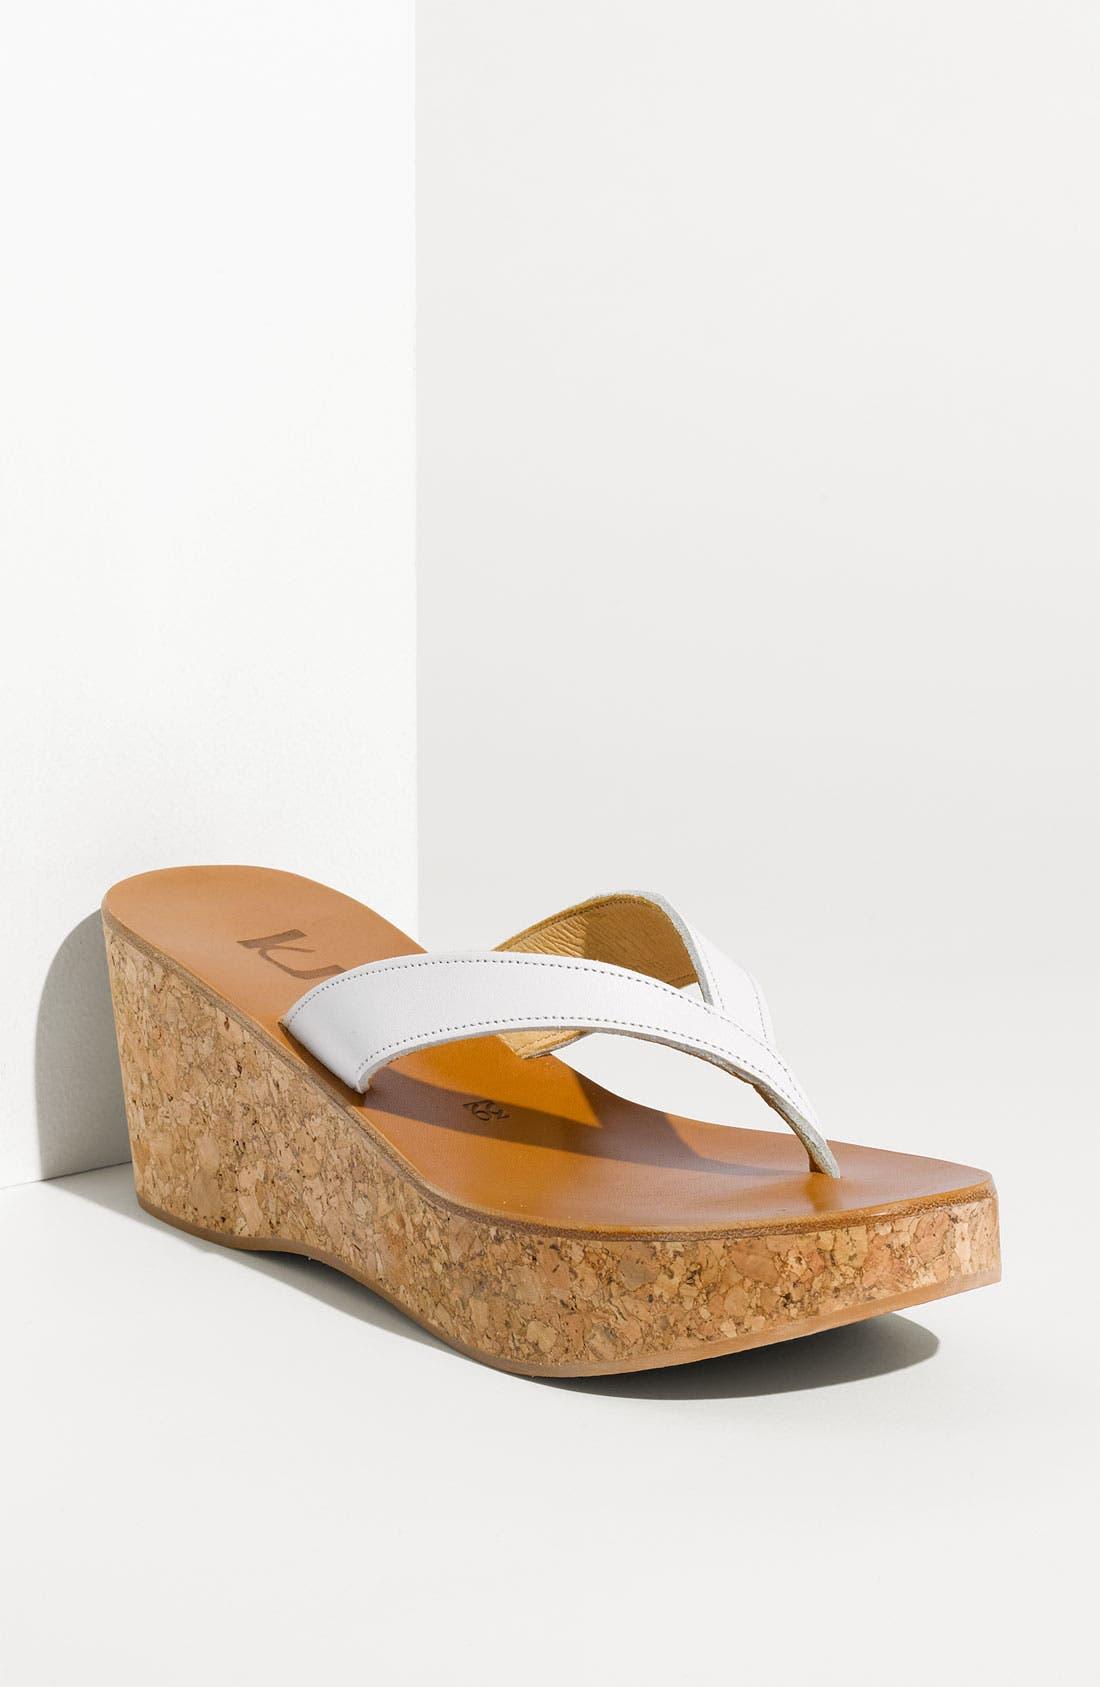 Alternate Image 1 Selected - K.Jacques St. Tropez 'Diorite' Wedge Sandal